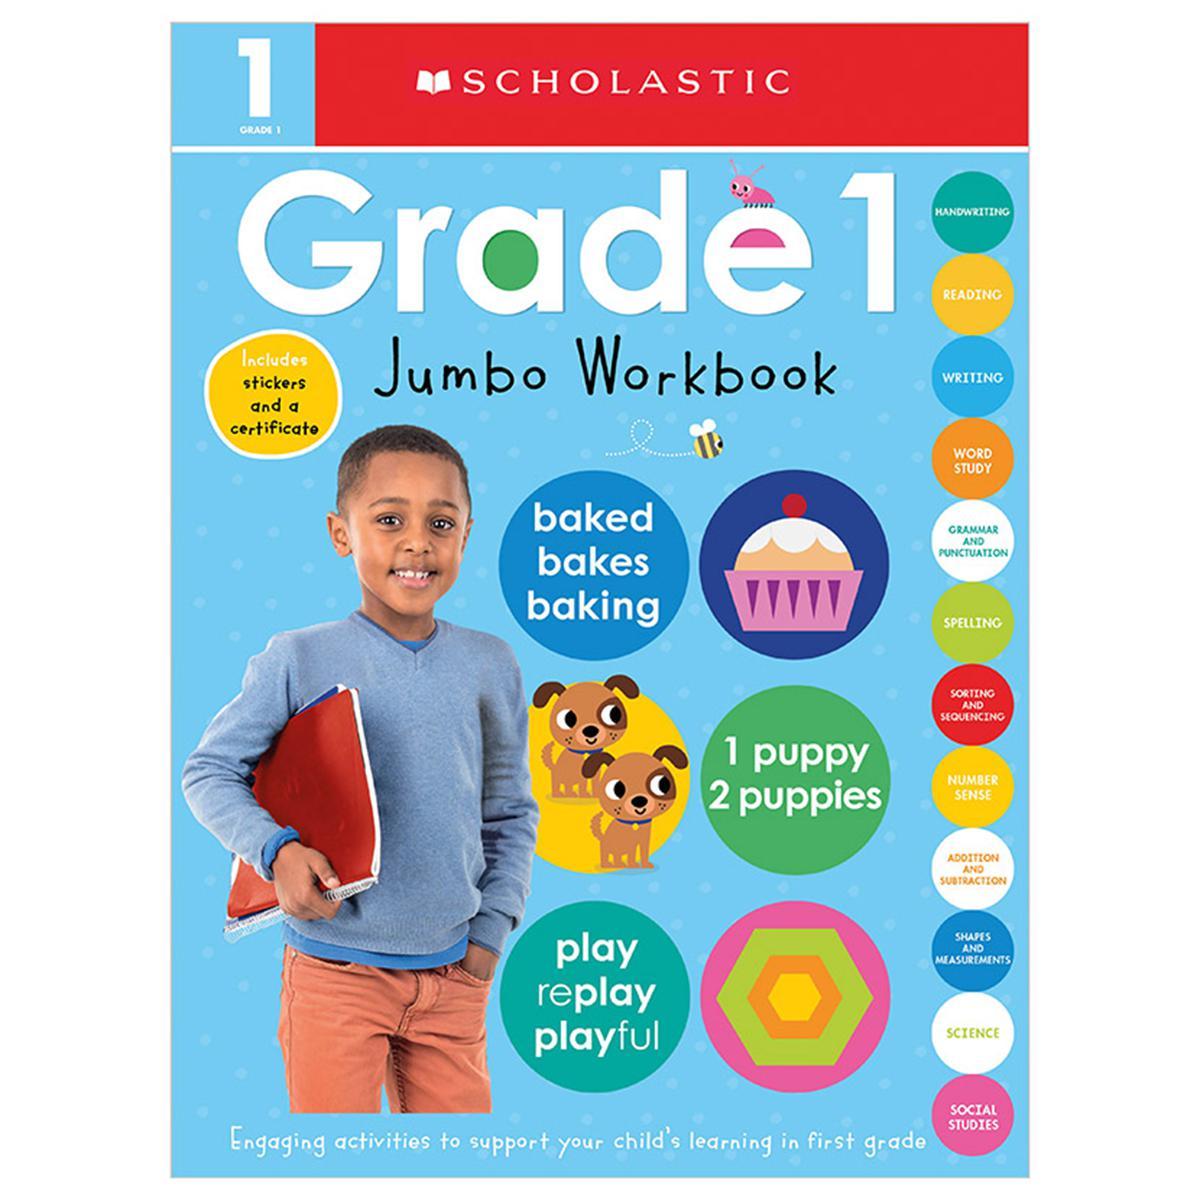 Scholastic Early Learners: Grade 1 Jumbo Workbook